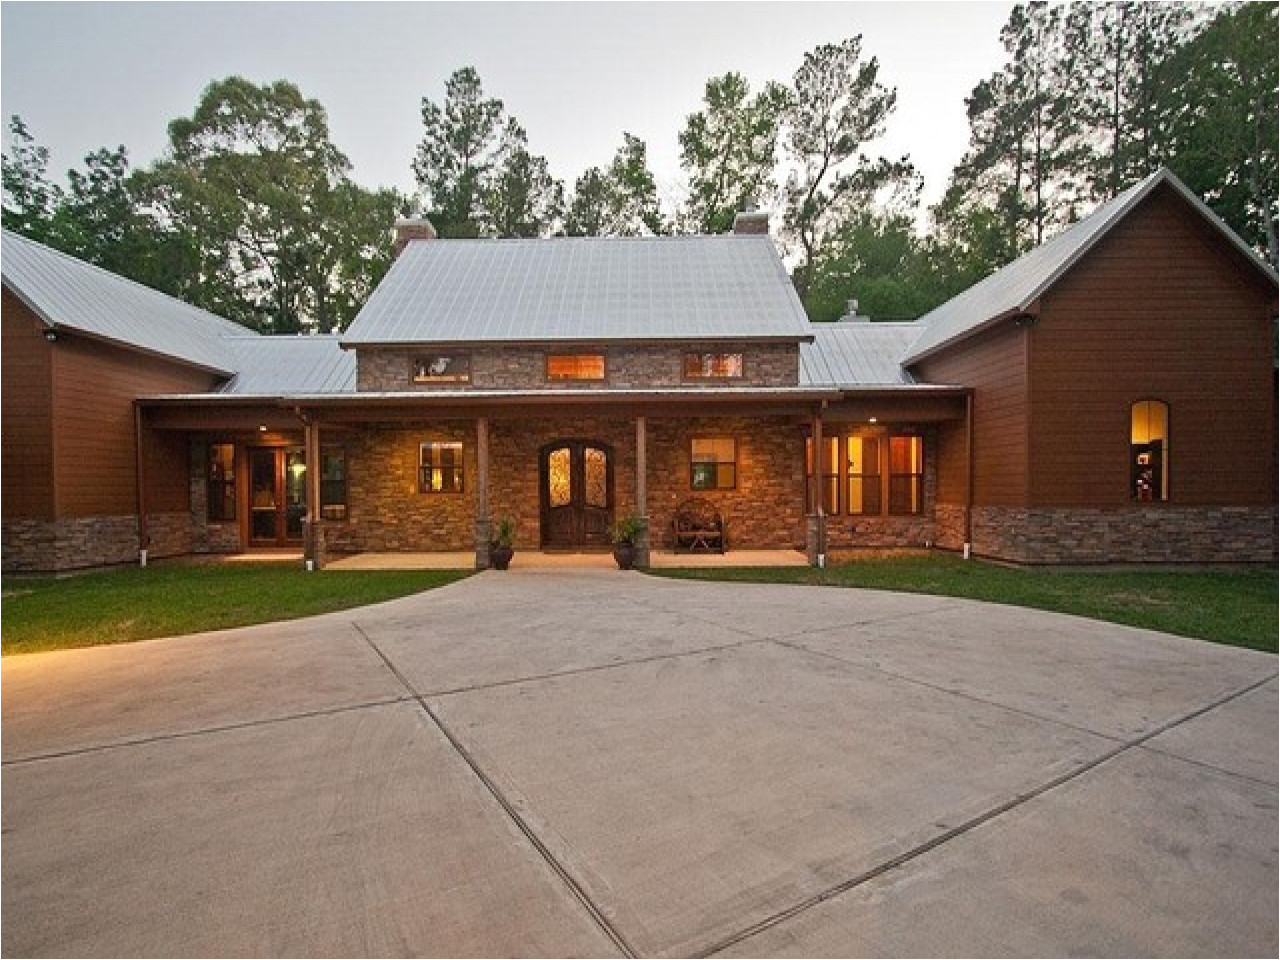 Contemporary Ranch Home Plans Inspiring Contemporary Ranch Home Plans Photo House